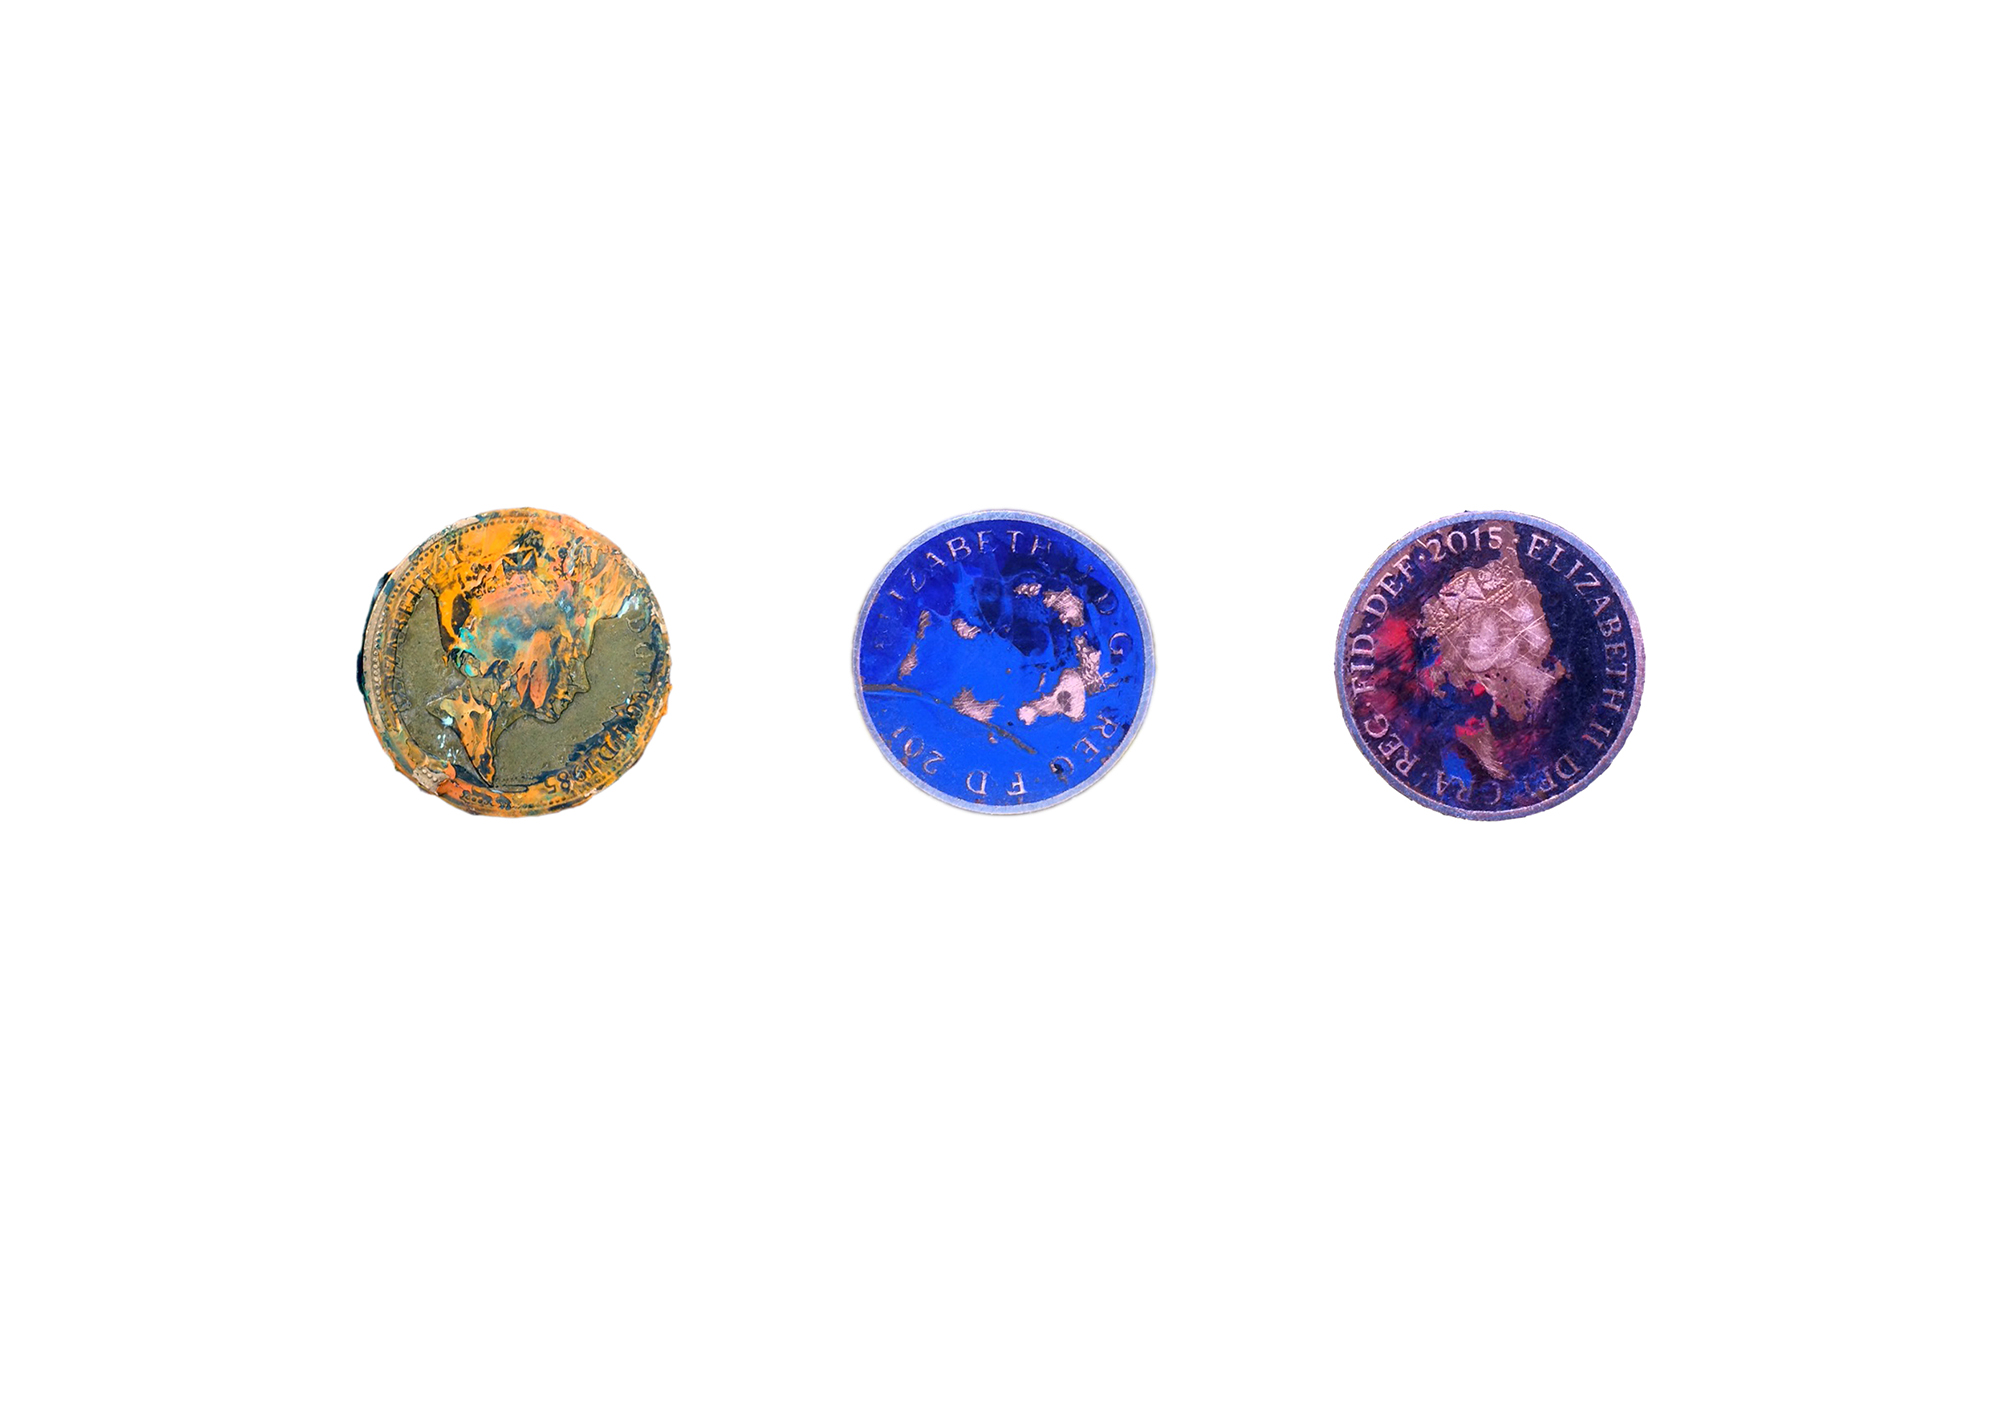 coins8 copy 2